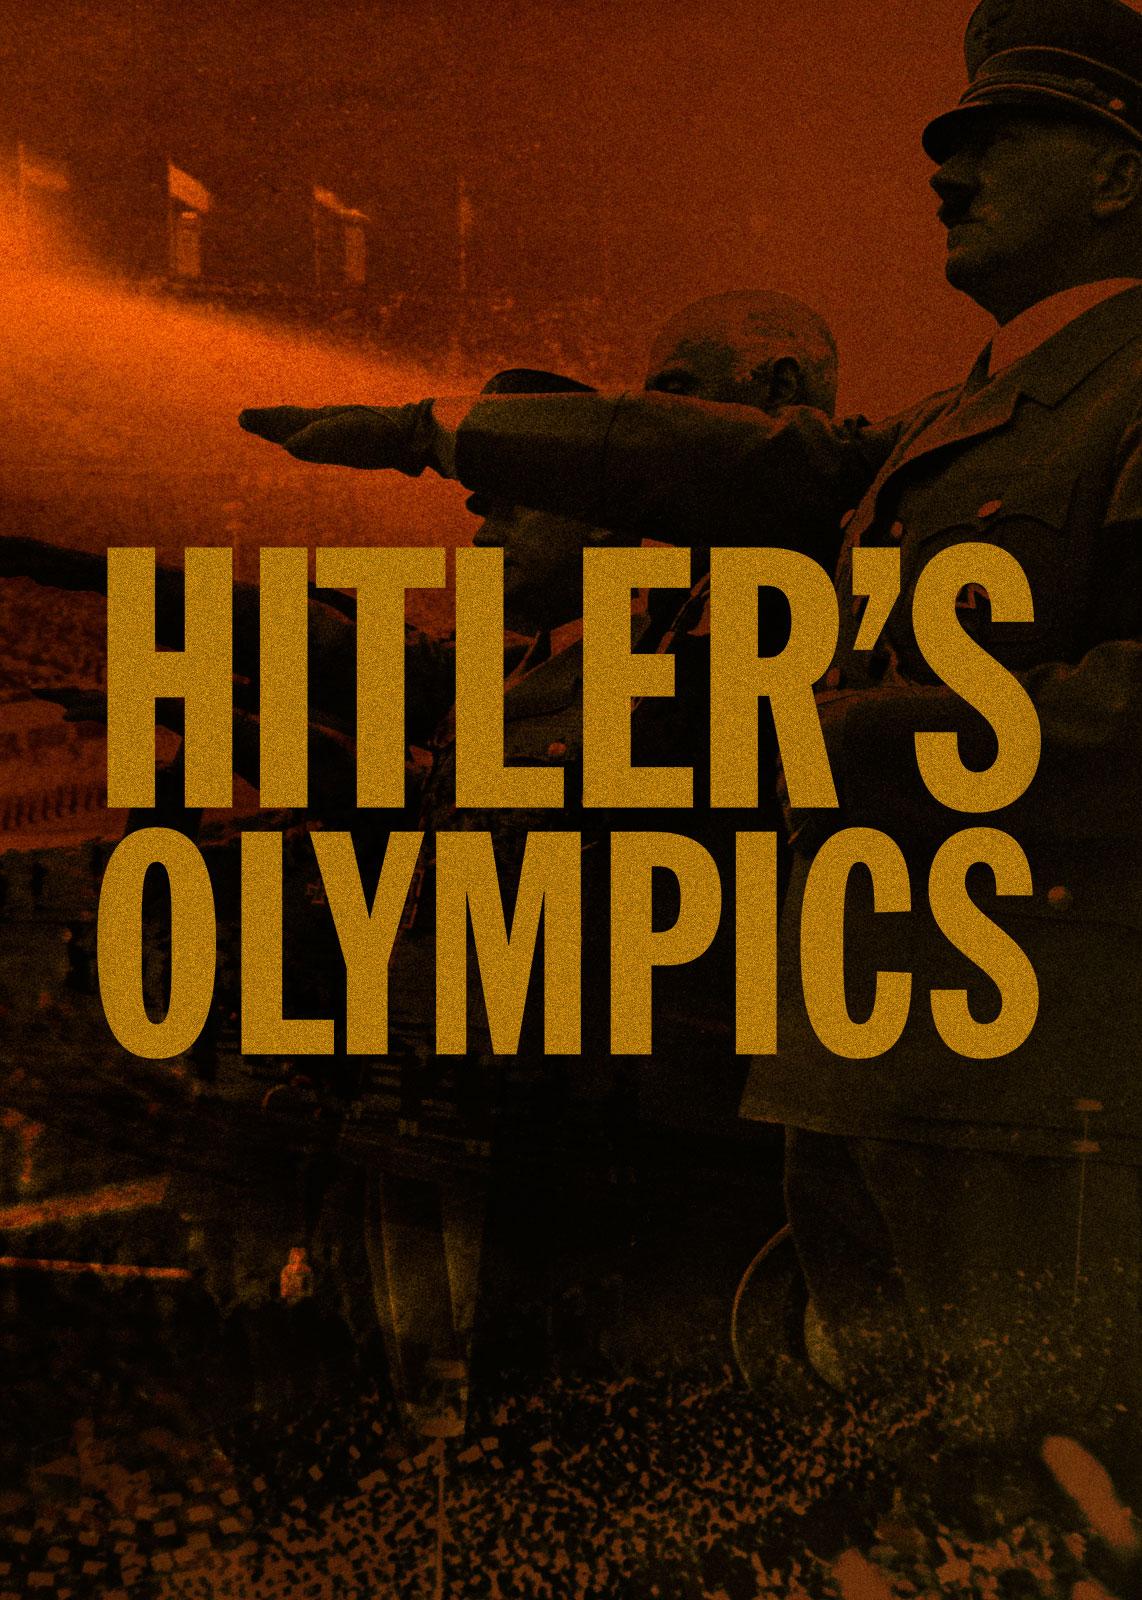 [Hitlers-Olympics]_1142x1600.jpg